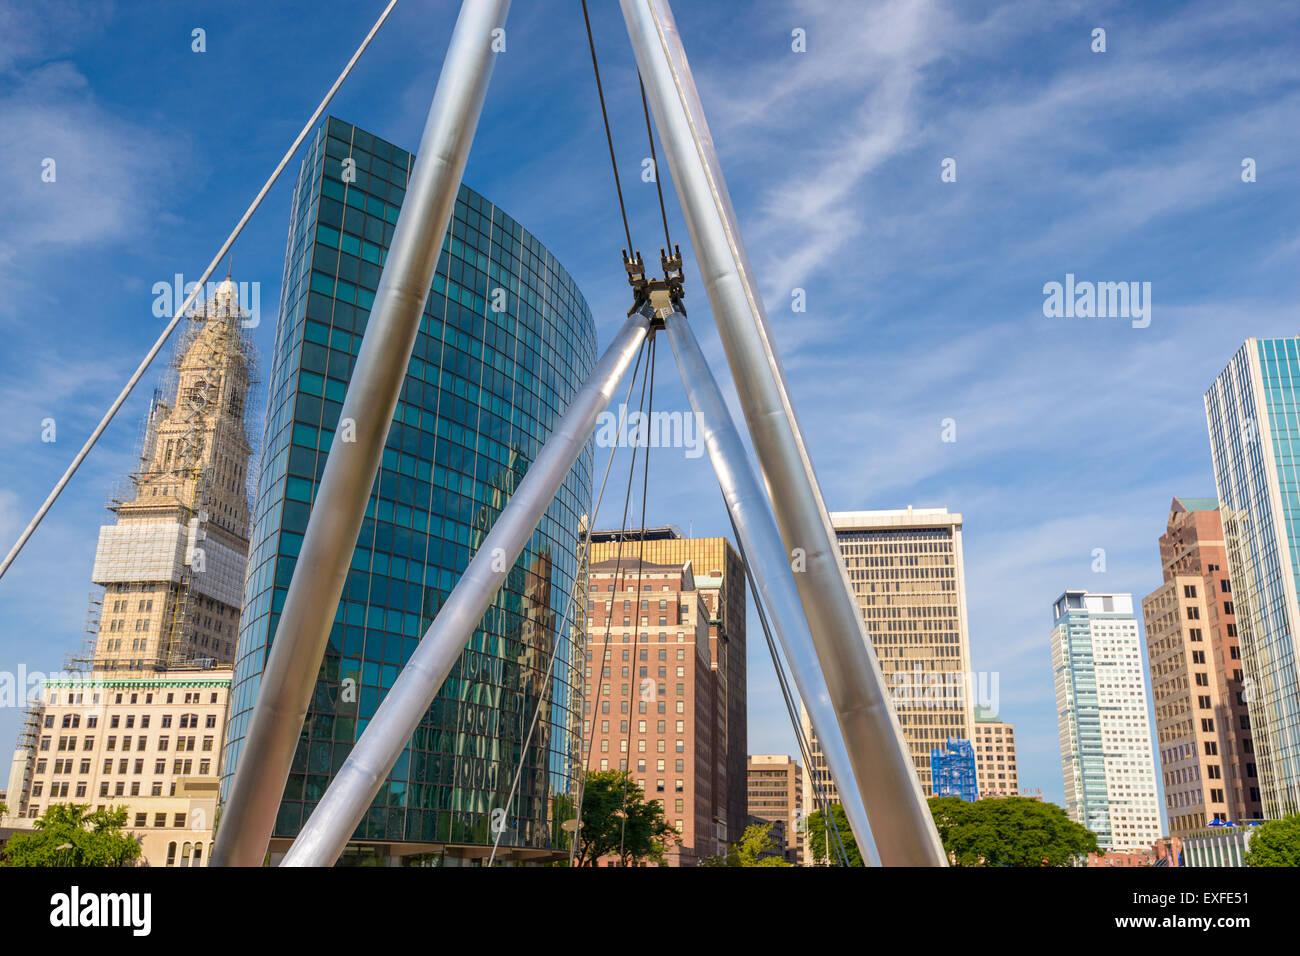 Hartford, Connecticut, USA cityscape at Founders Bridge. - Stock Image